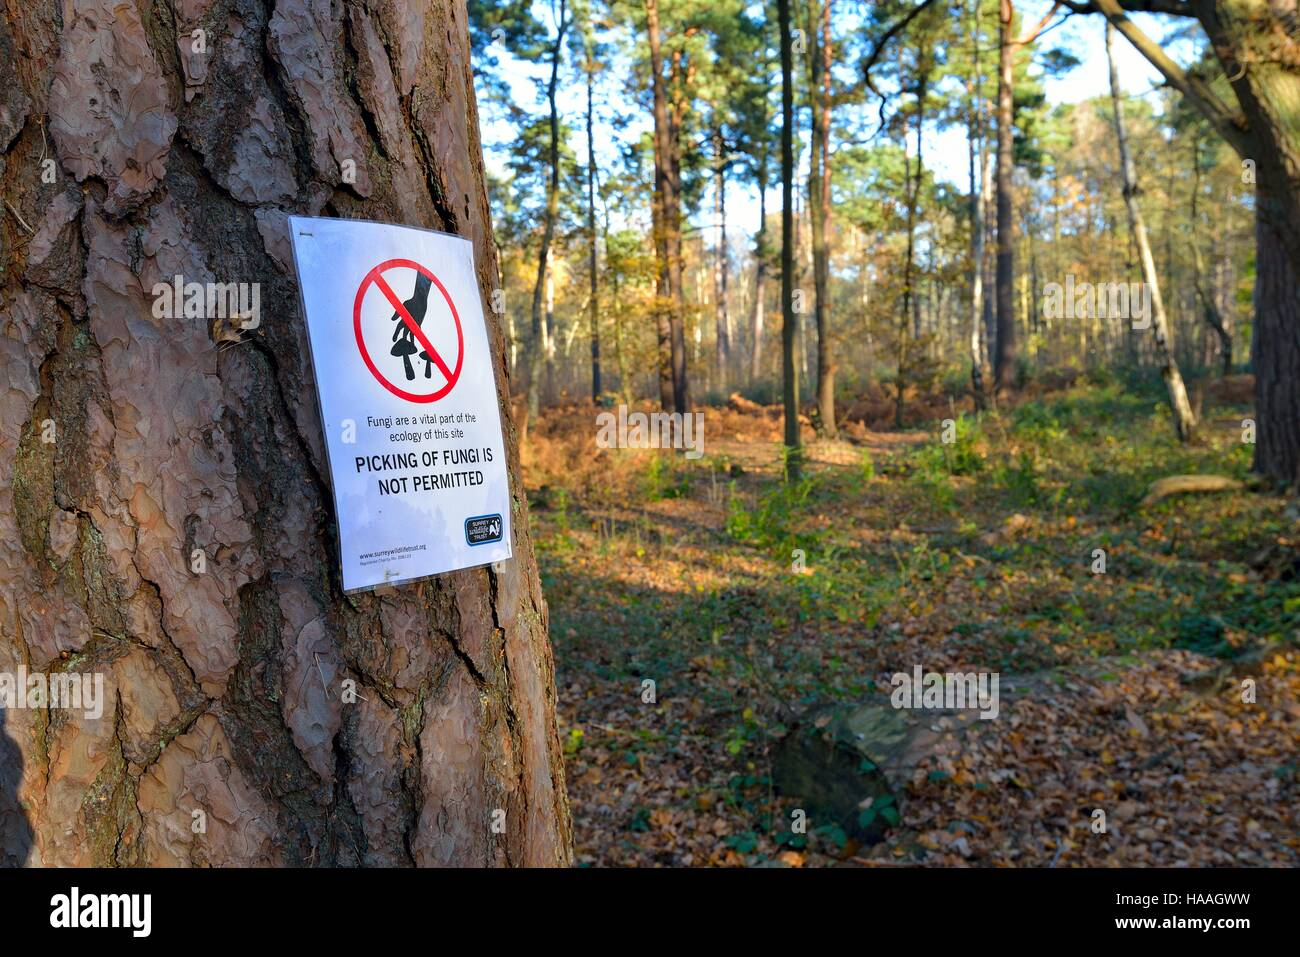 Warning sign on tree stating not to pick fungi - Stock Image